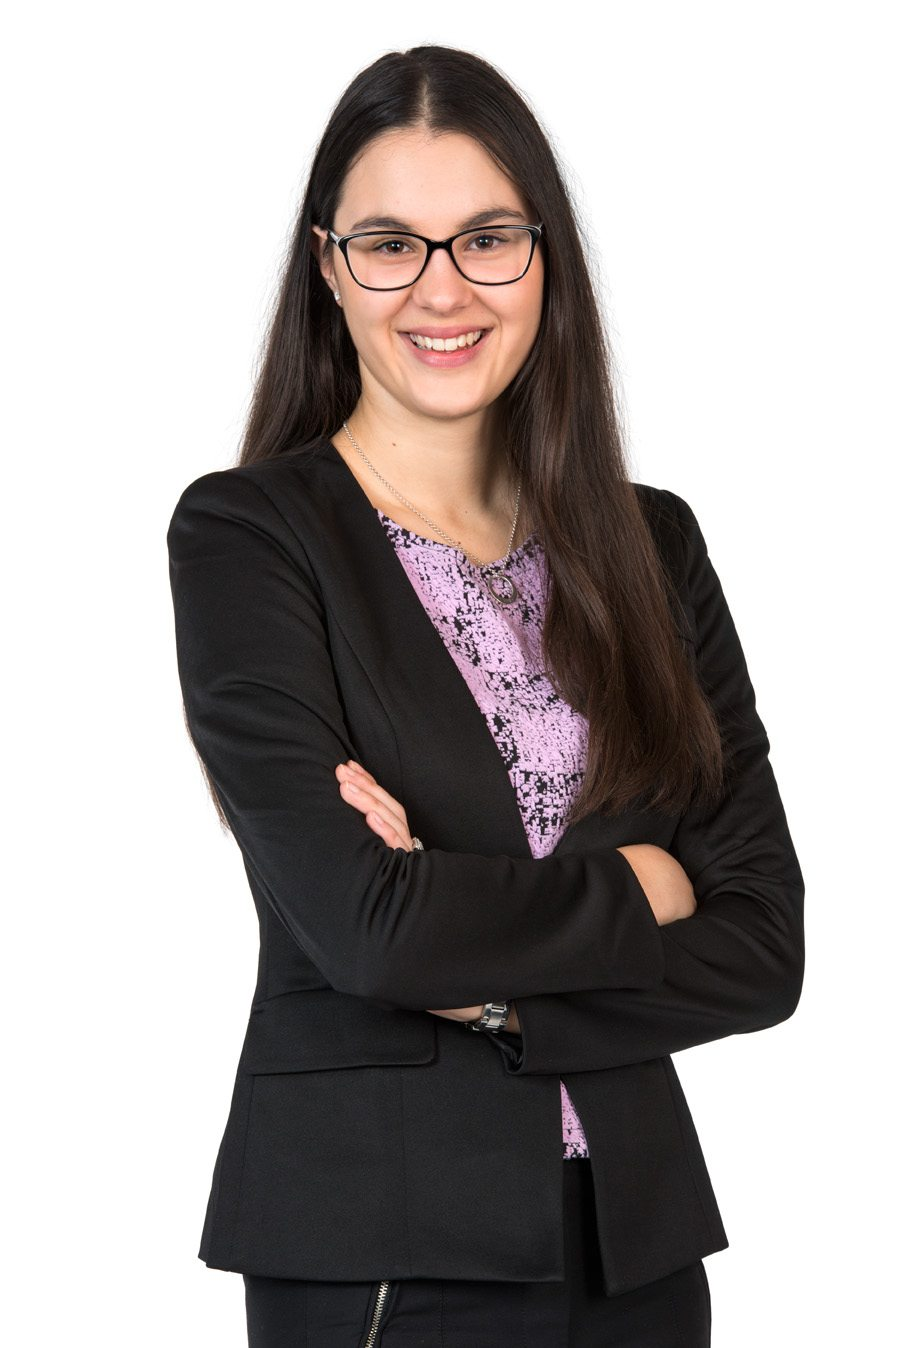 Julia Schinella